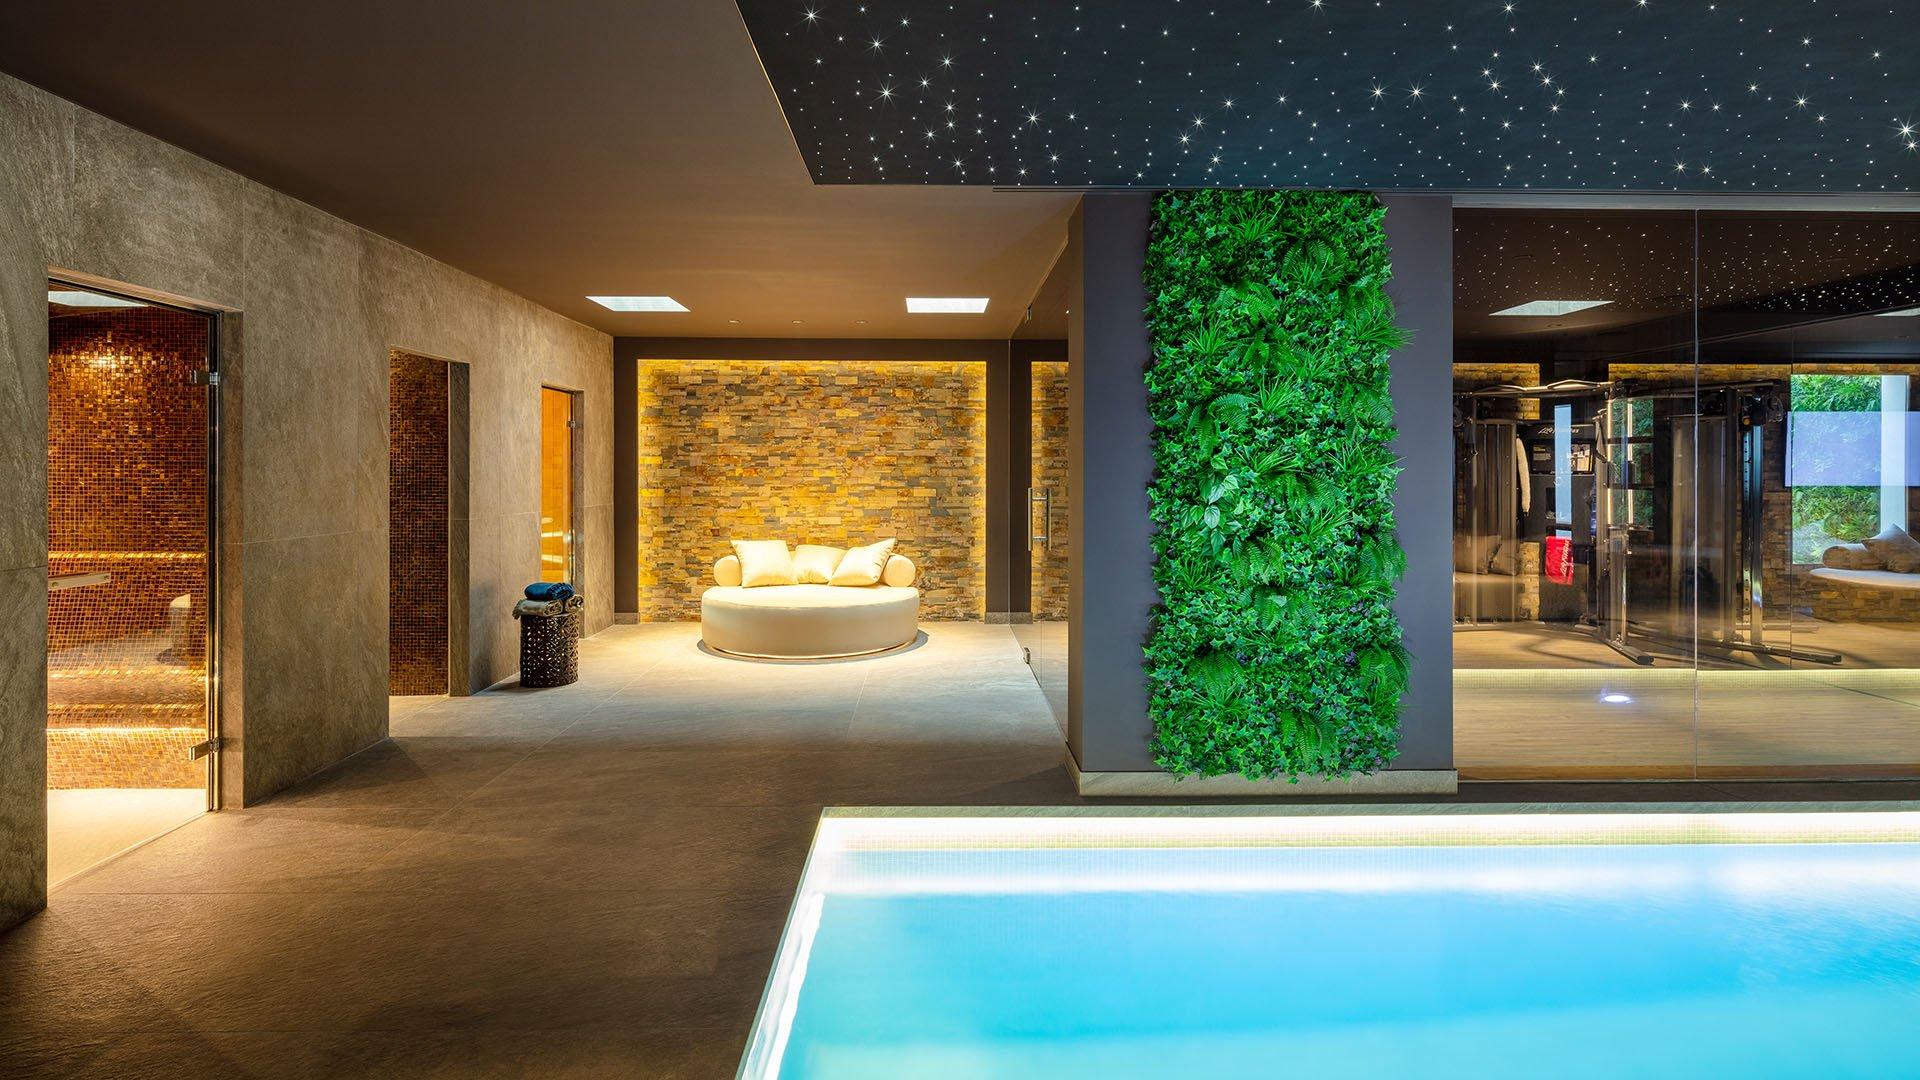 La Cerquilla 40: Fenomenale nieuwbouw villa in het hart van La Cerquilla, Marbella